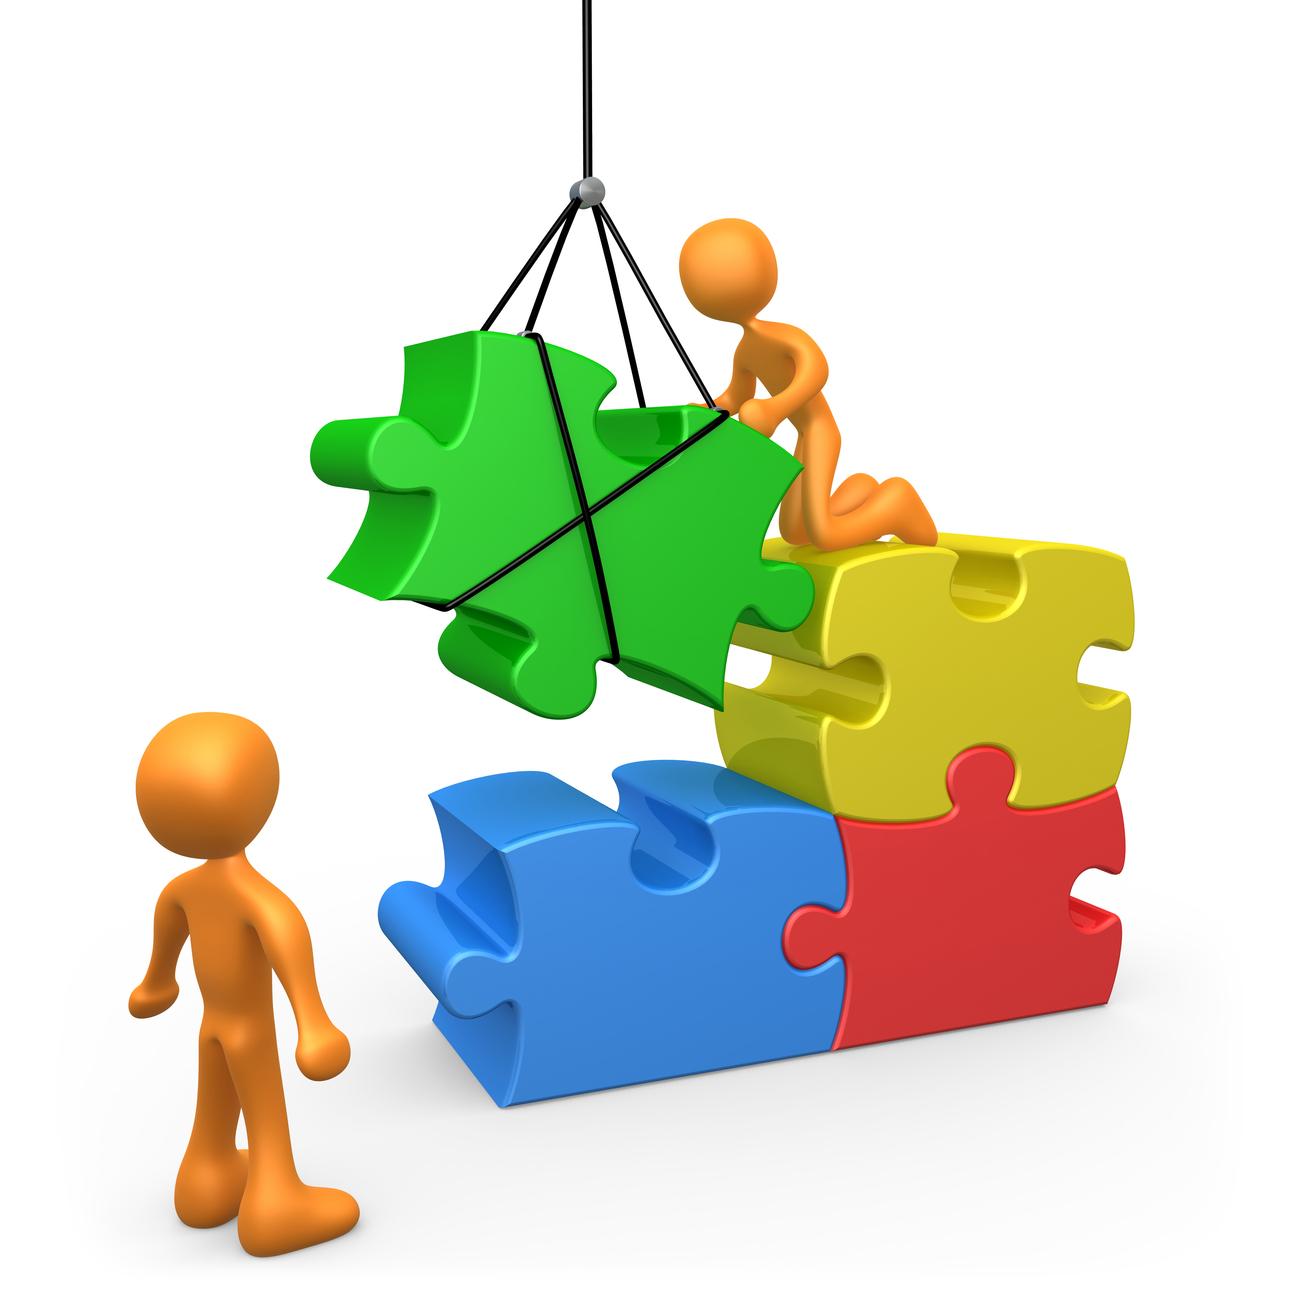 Professional clipart top management #12